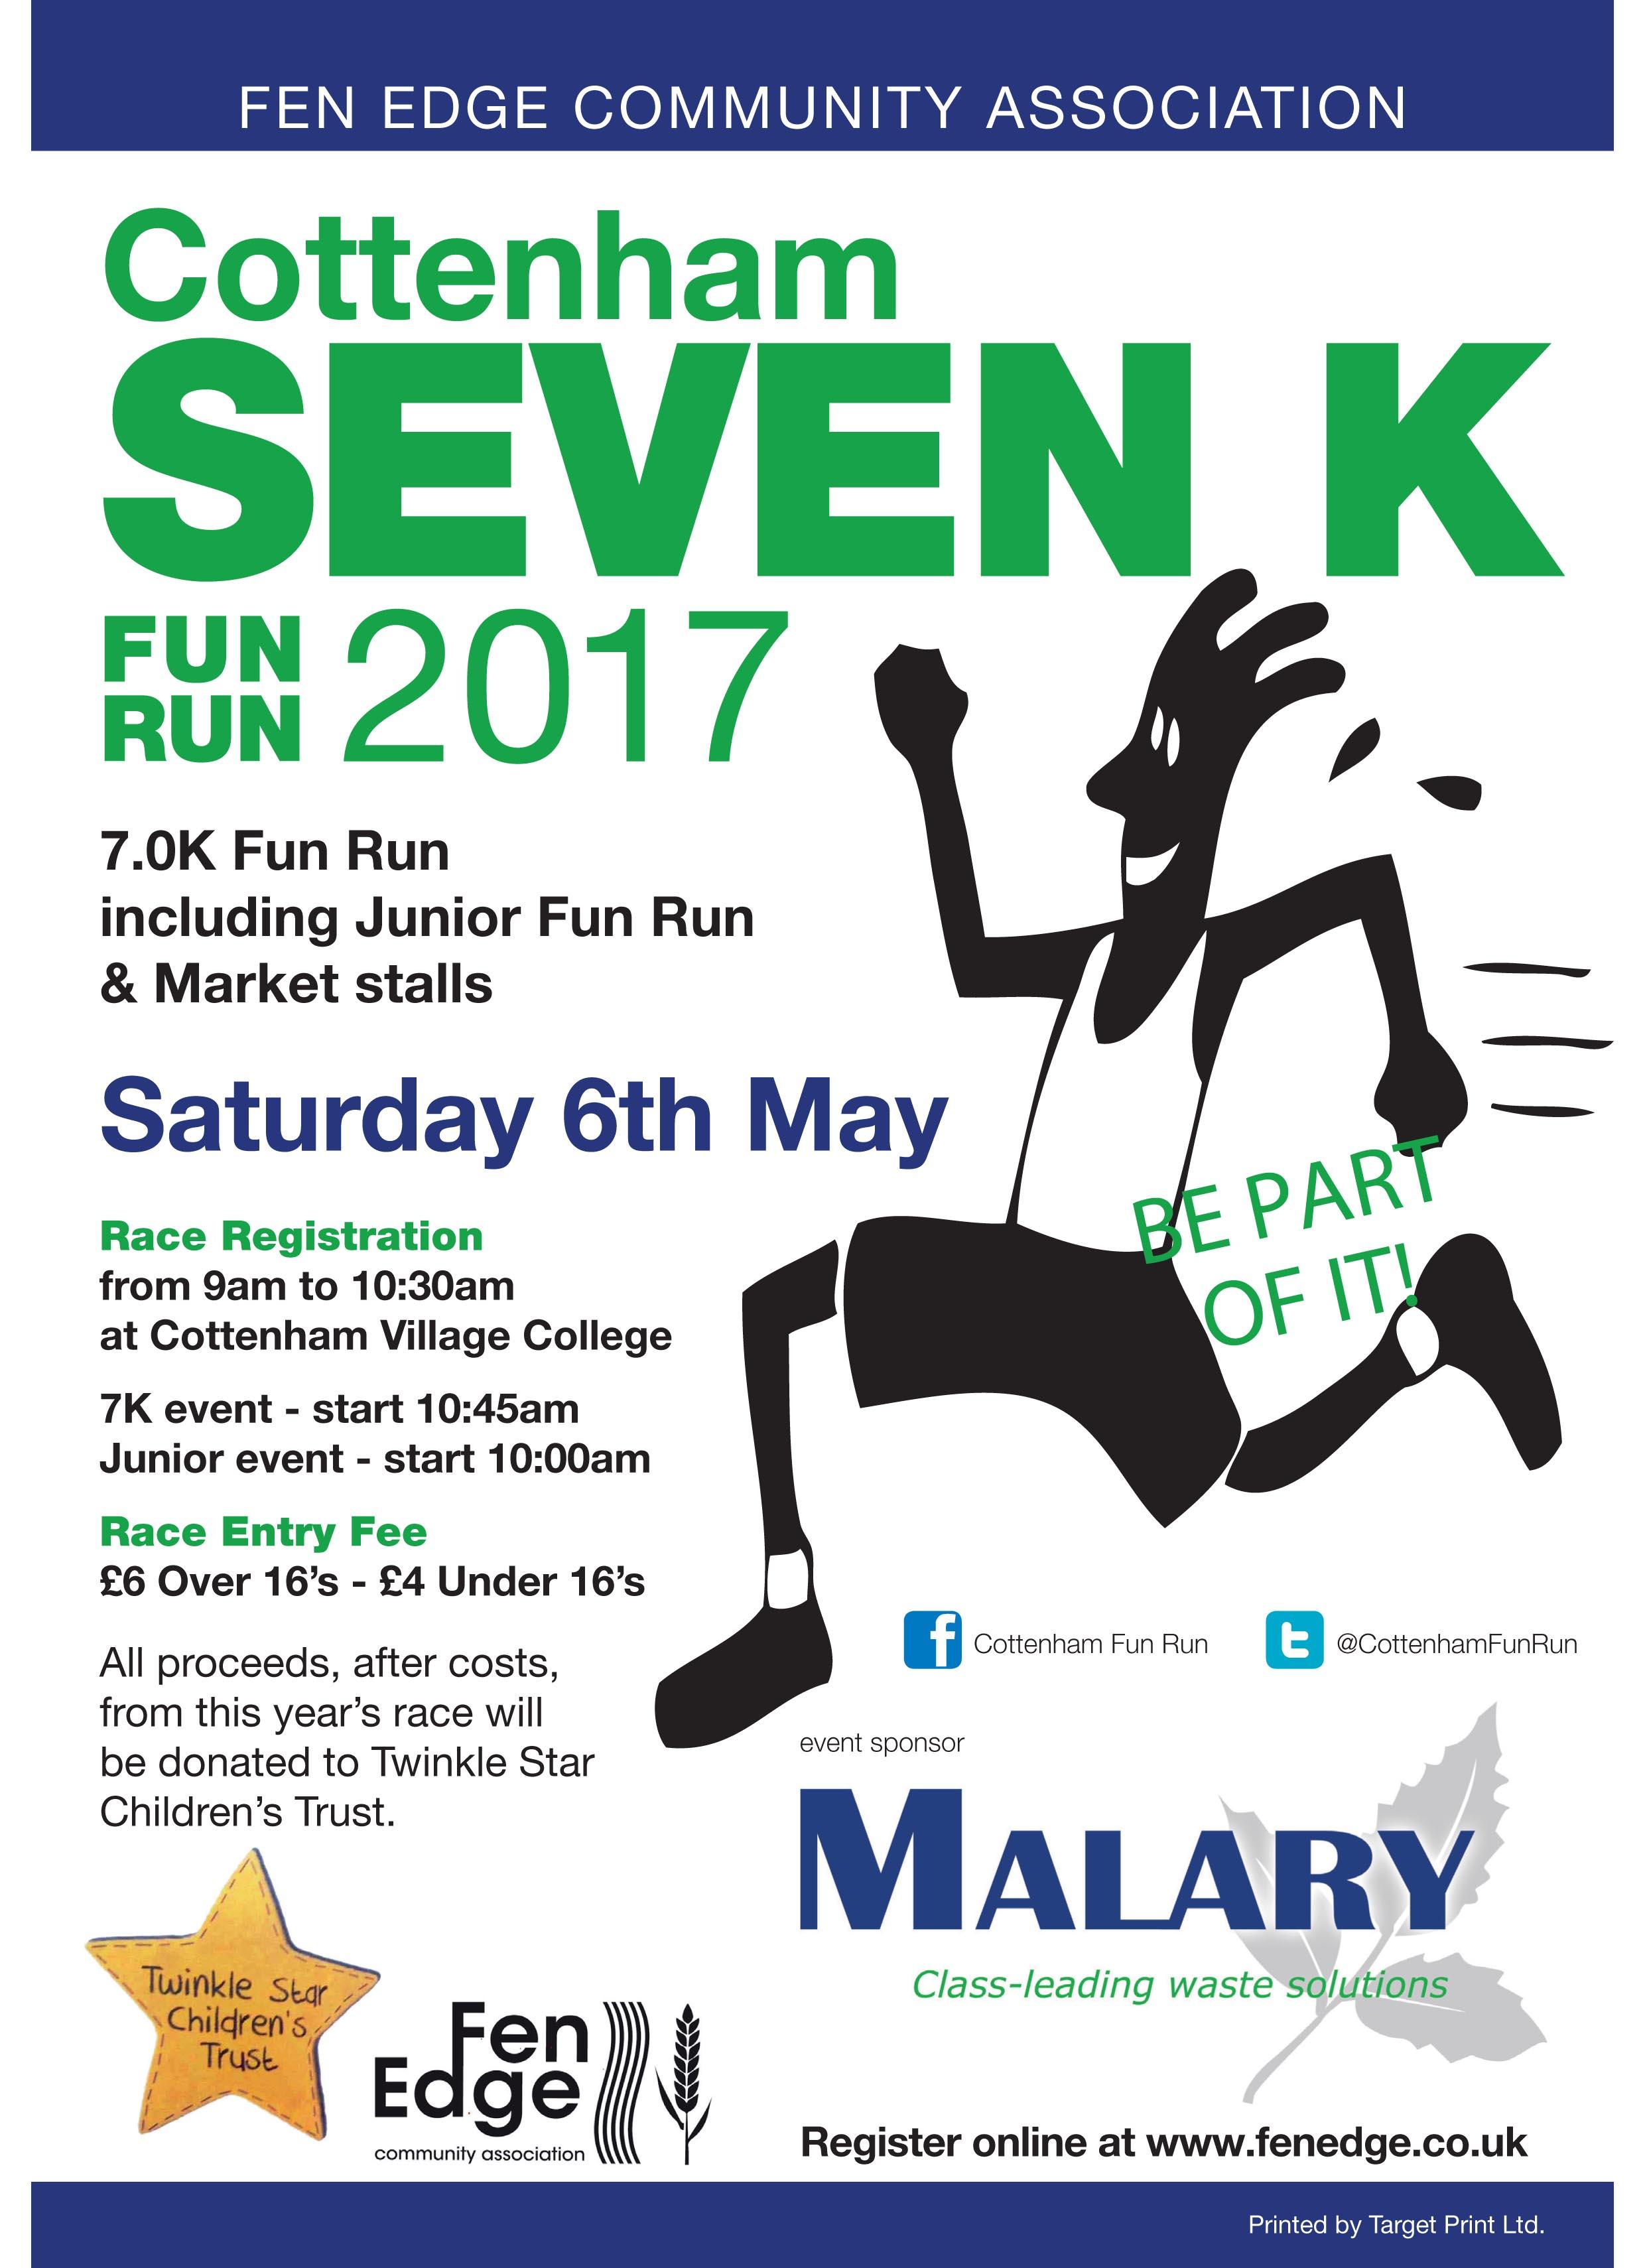 Cottenham Fun Run 2017